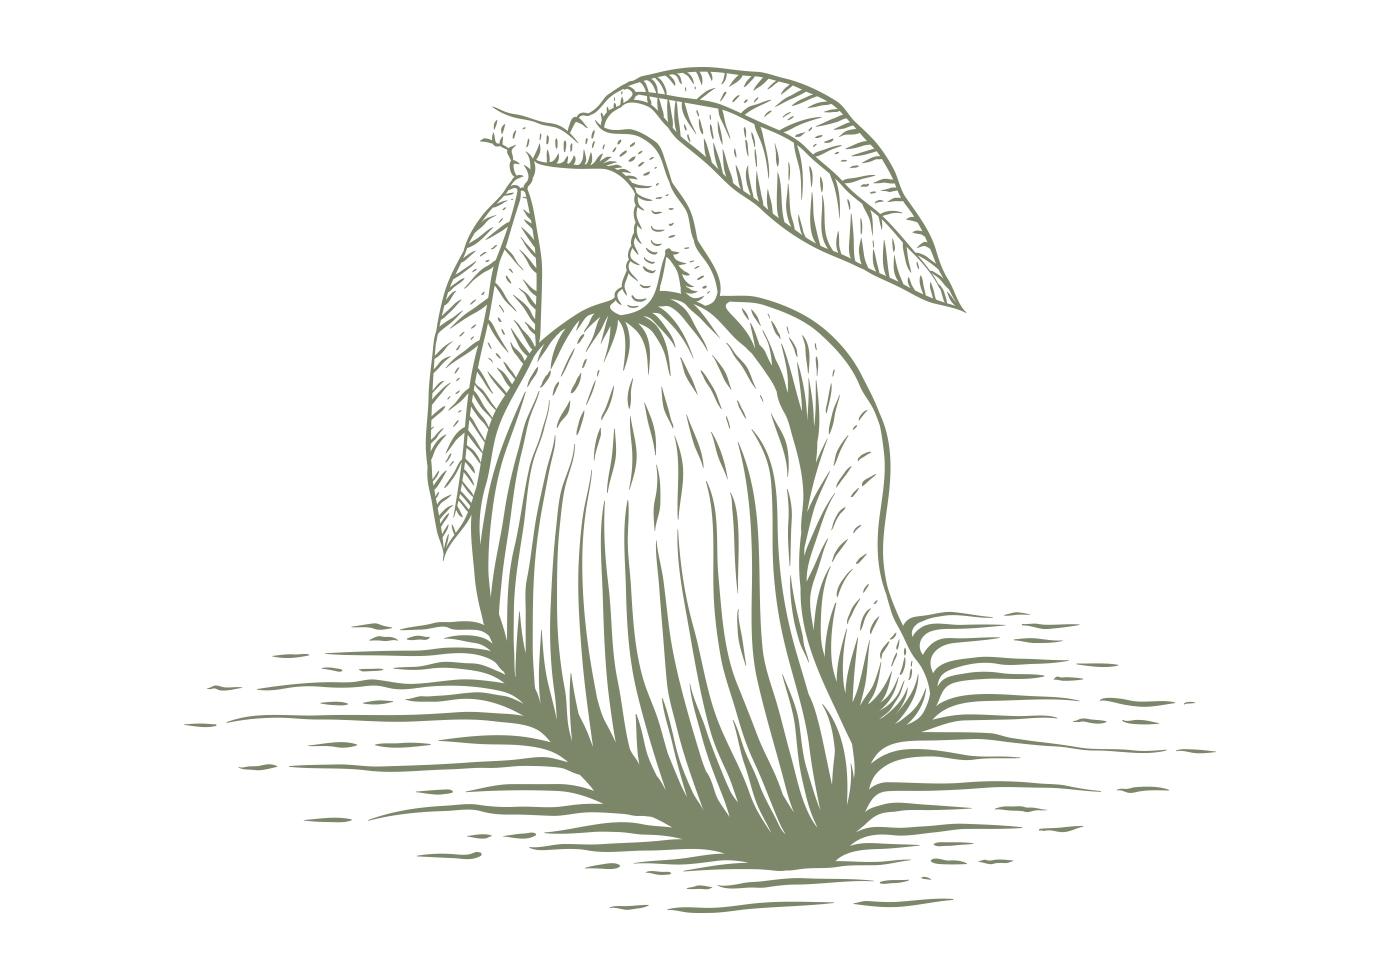 Mango Sketch Free Vector Art 33 Free Downloads